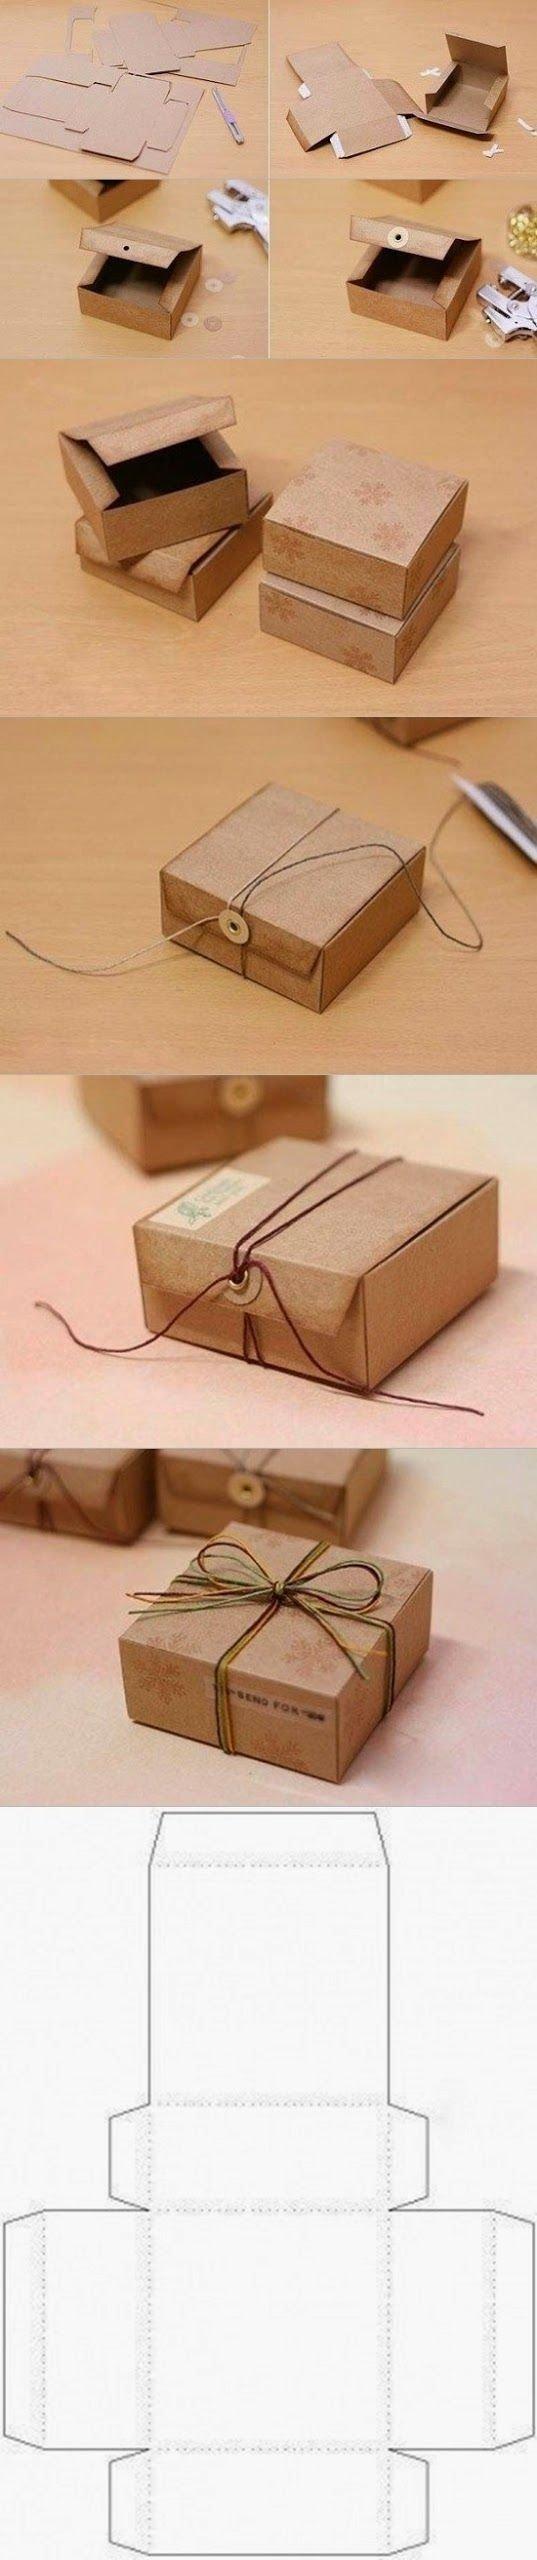 wood,design,...,